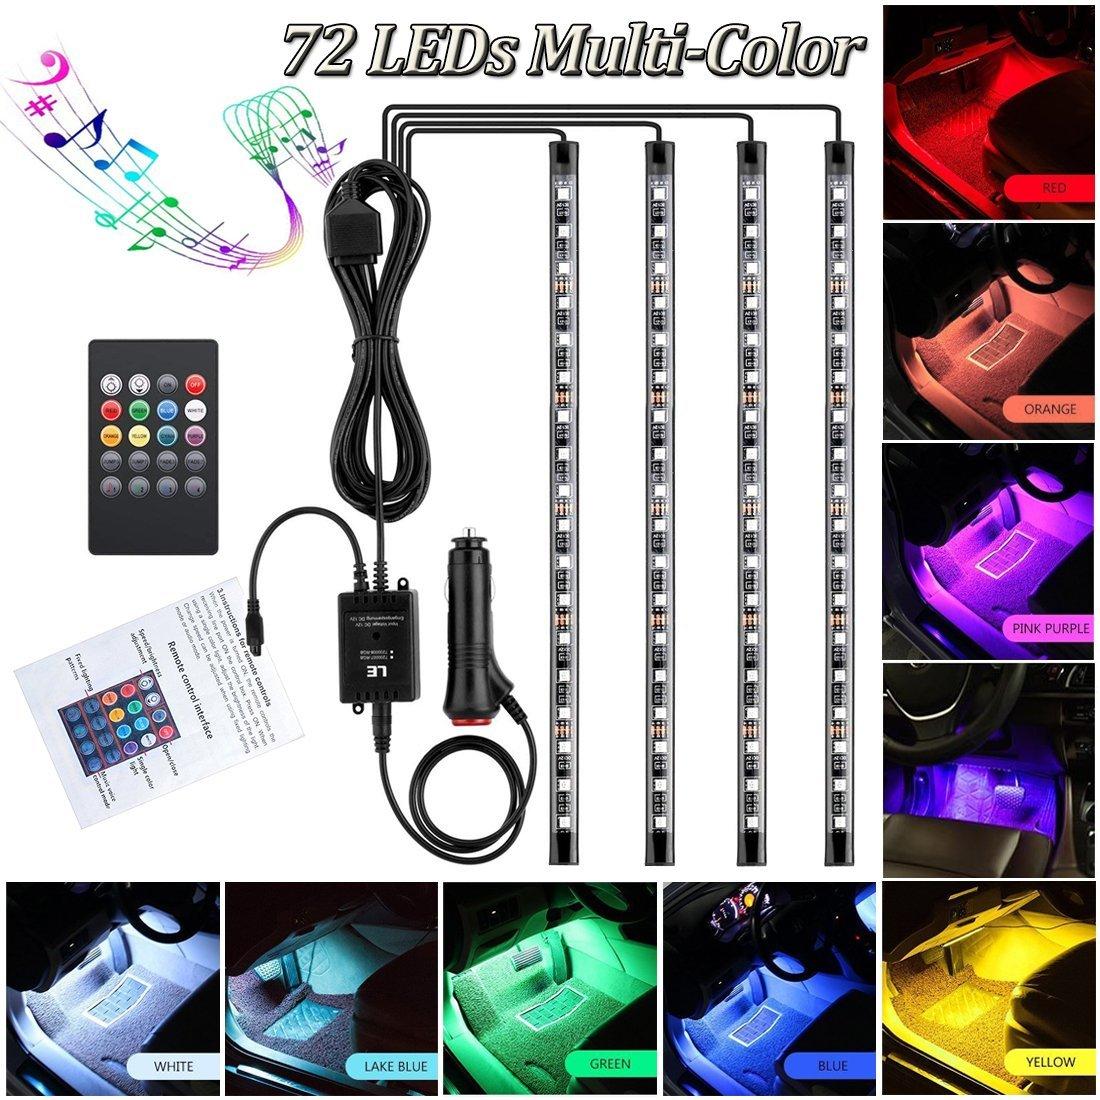 Car LED Strip Light for Cars,72 LED Car Interior Lights 12V Multicolor RGB Interior Car Atmosphere Neon Lights Under Dash Lighting Kit with Music Sound Active Wireless Remote Control, (12V- 72 LEDs)